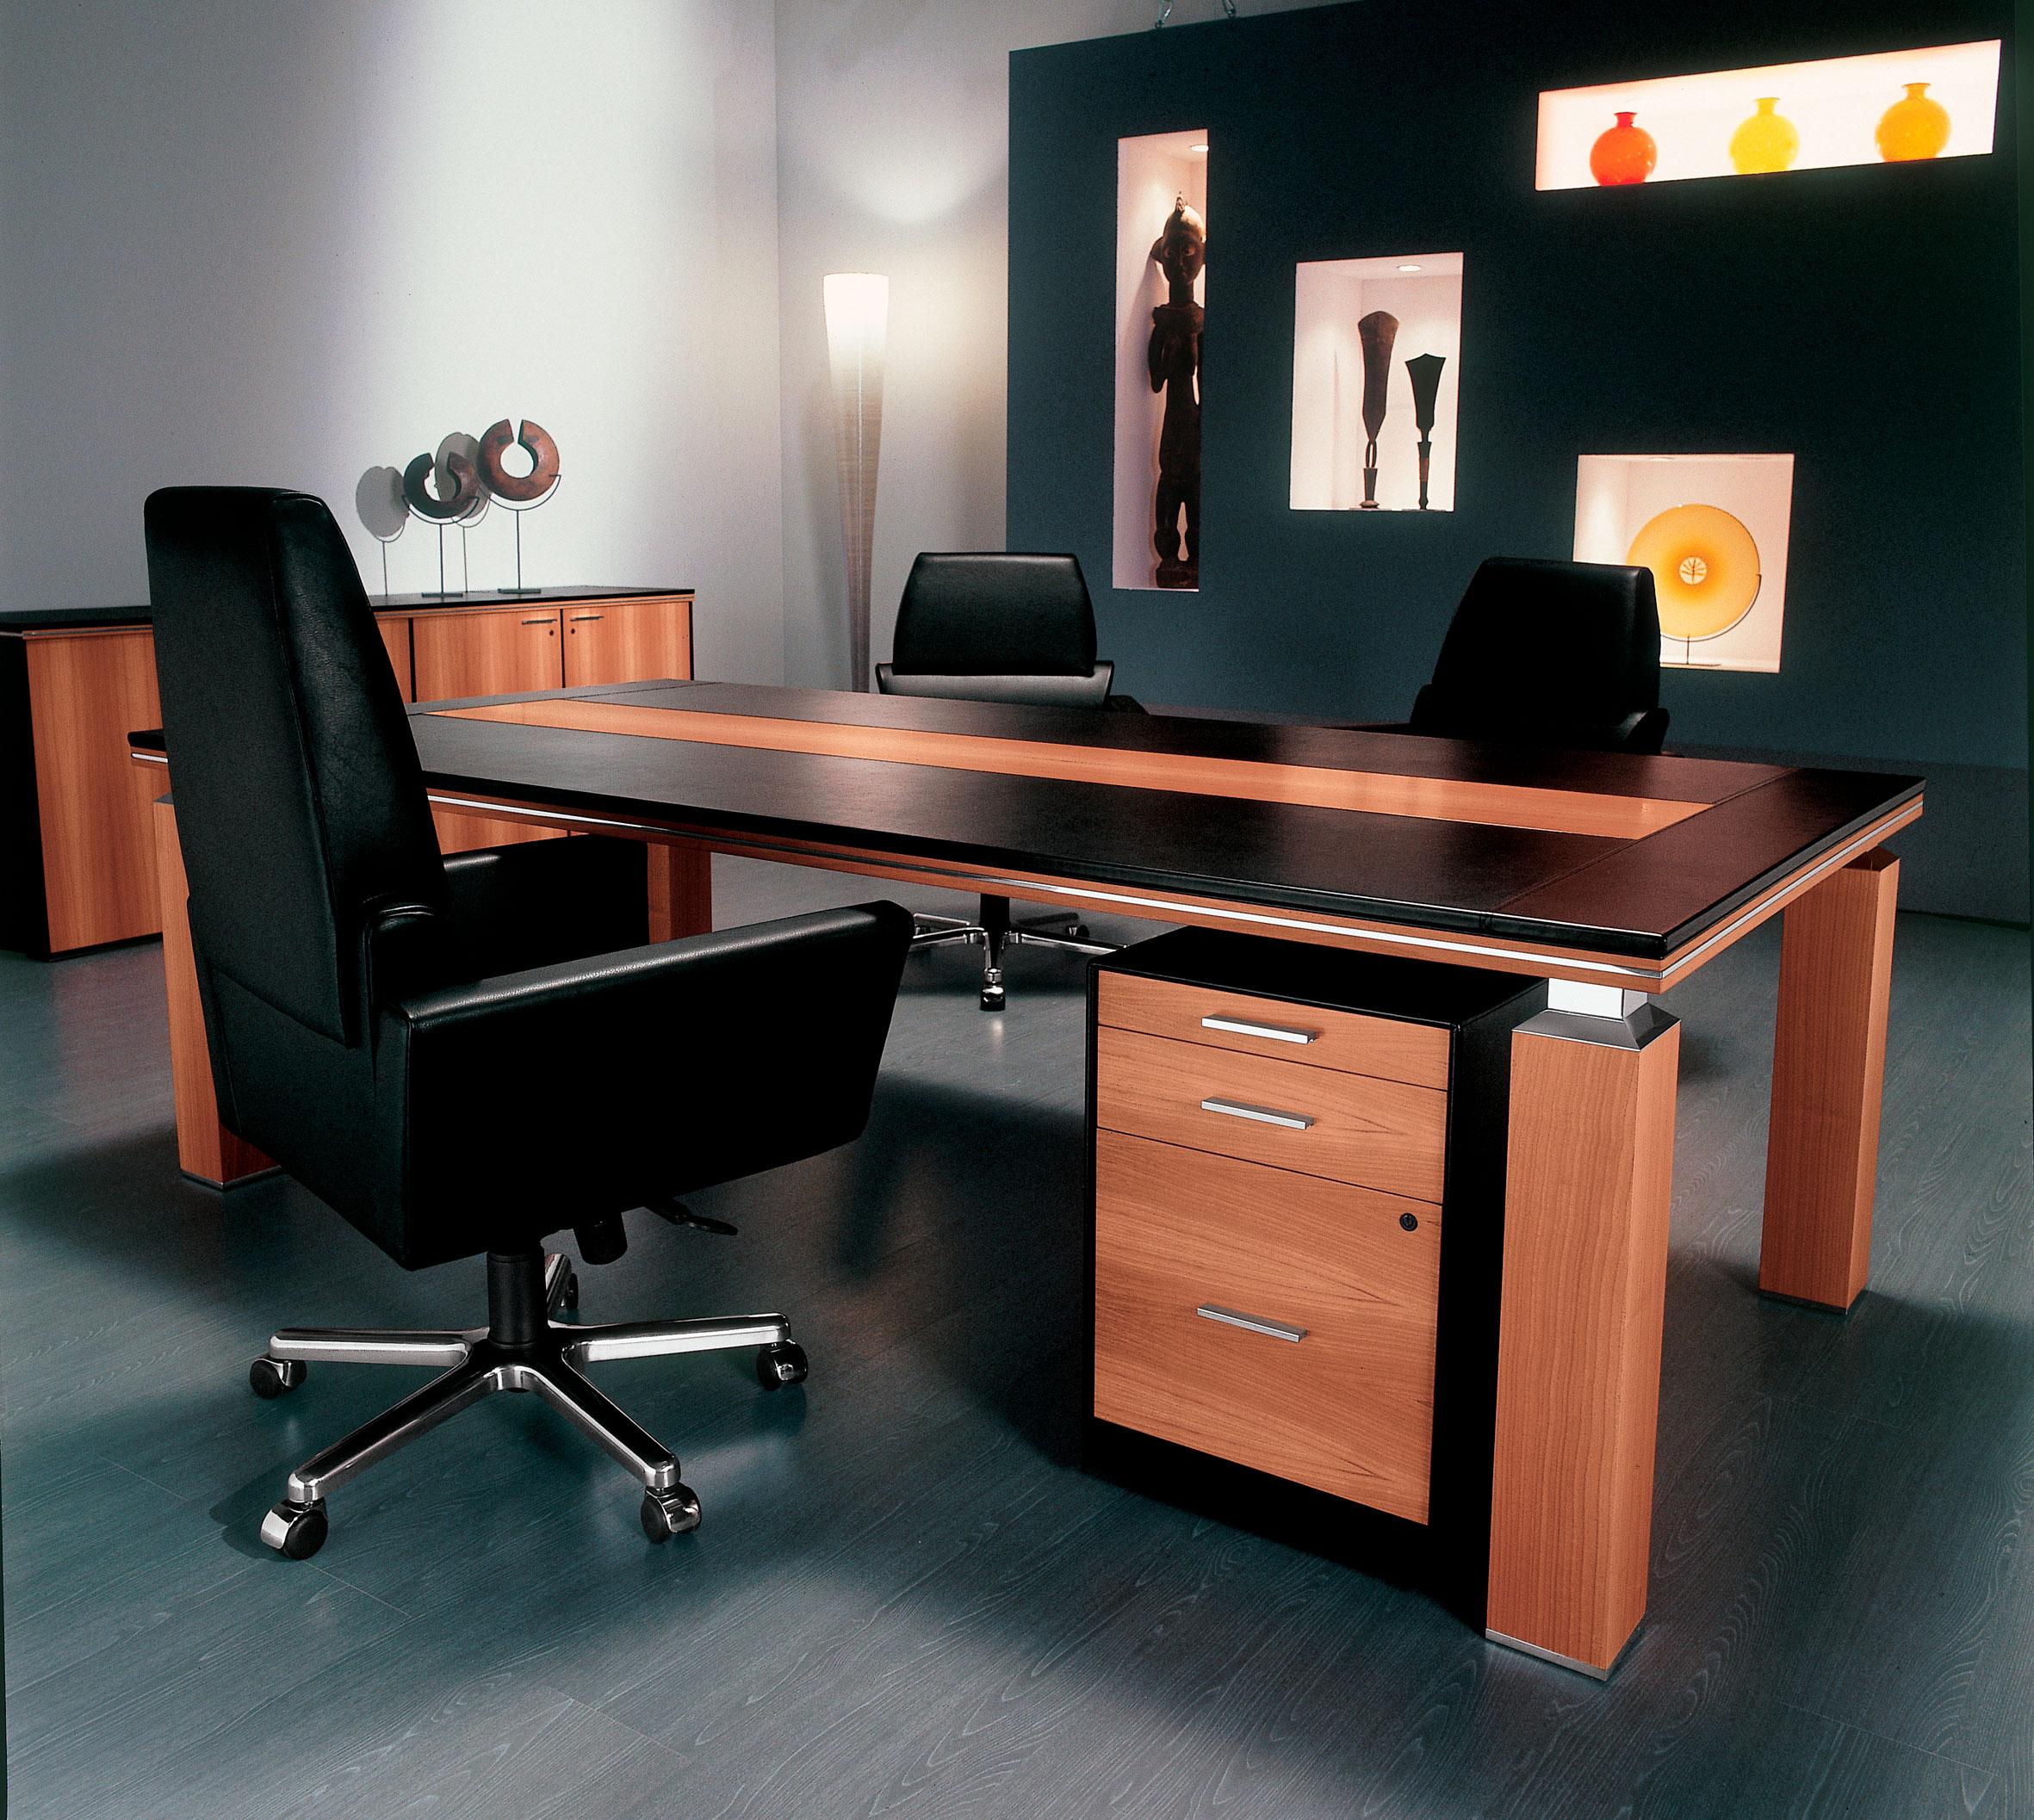 Письменный стол i4 mariani - executive office furnitures куп.